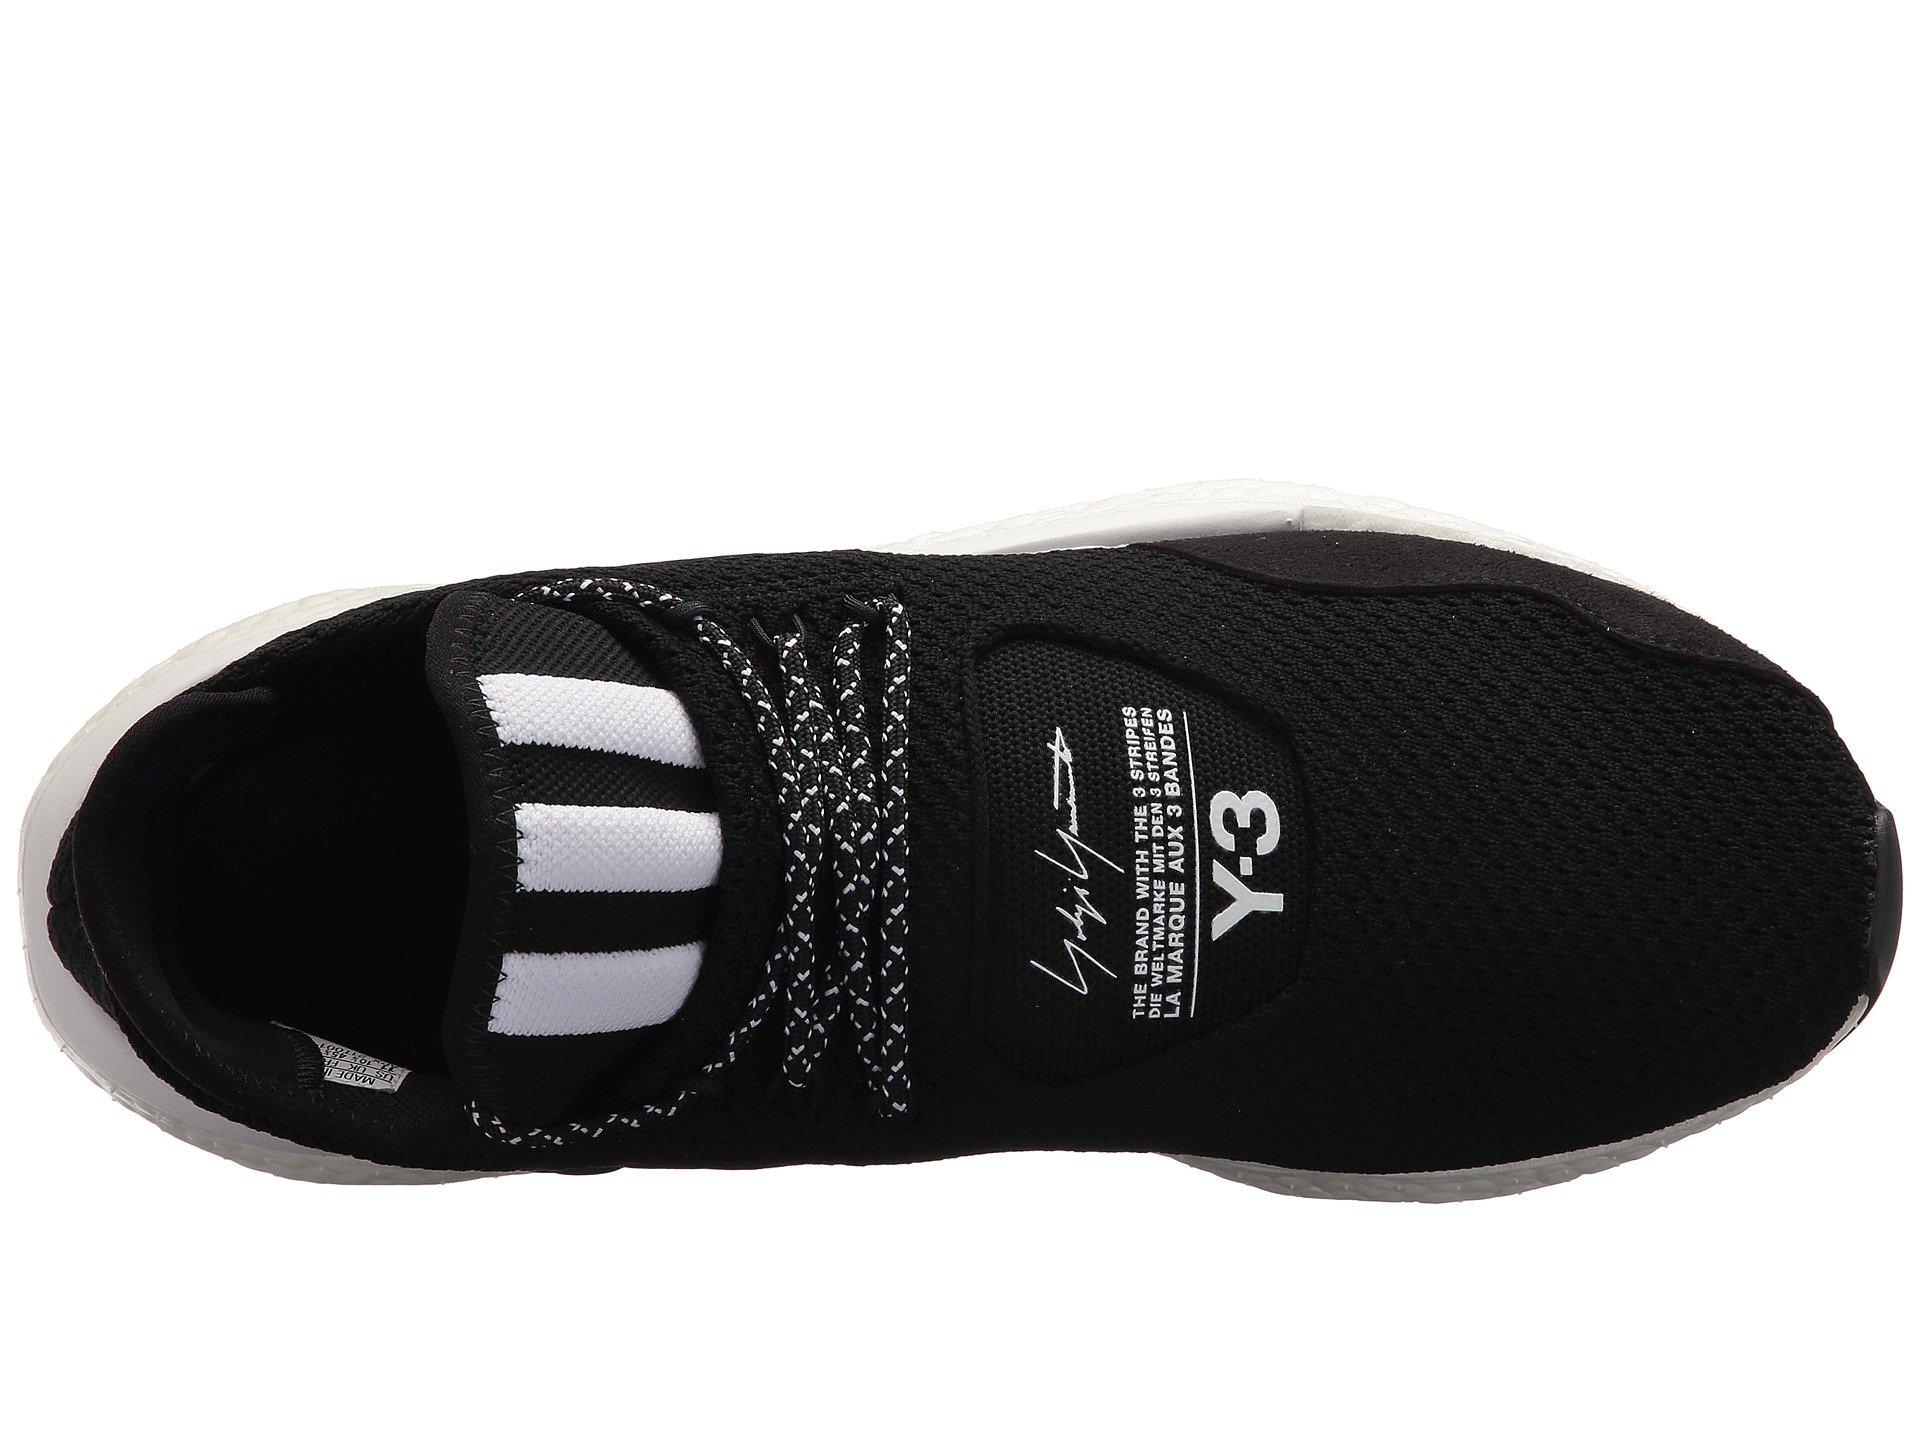 Y 3 Yohji Core footwear Adidas Saikou Yamamoto By Black White White core 1wSddaq